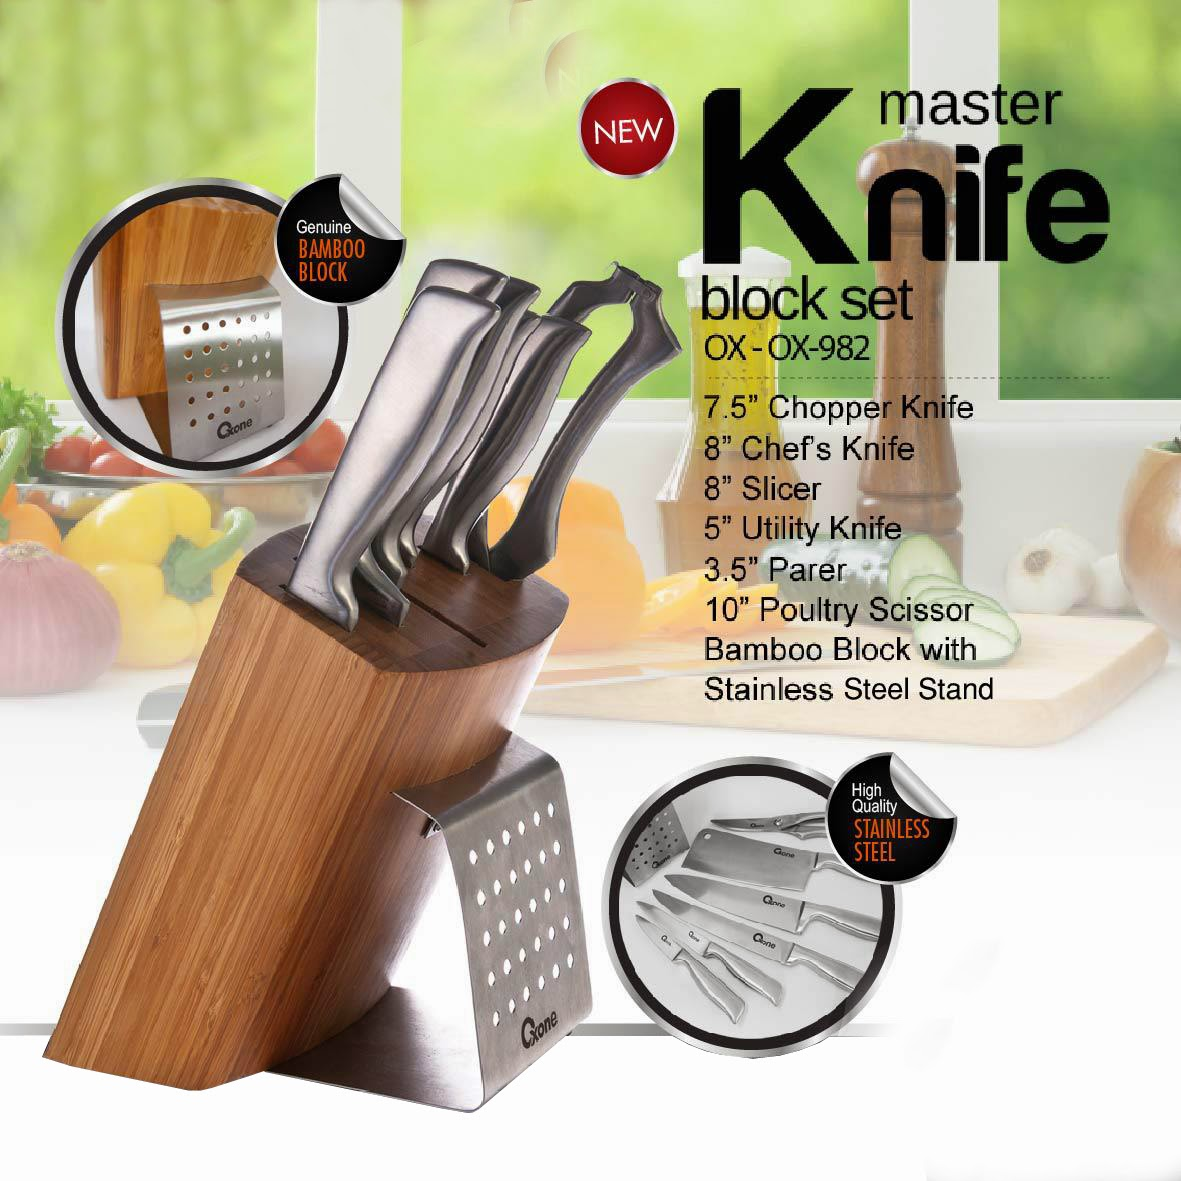 Dapur Oxone Perlengkapan Rumah Tangga October 2014 Deep Fryer Penggorengan Listrik Kode Ox989 Ox 982 Master Knife Block Set